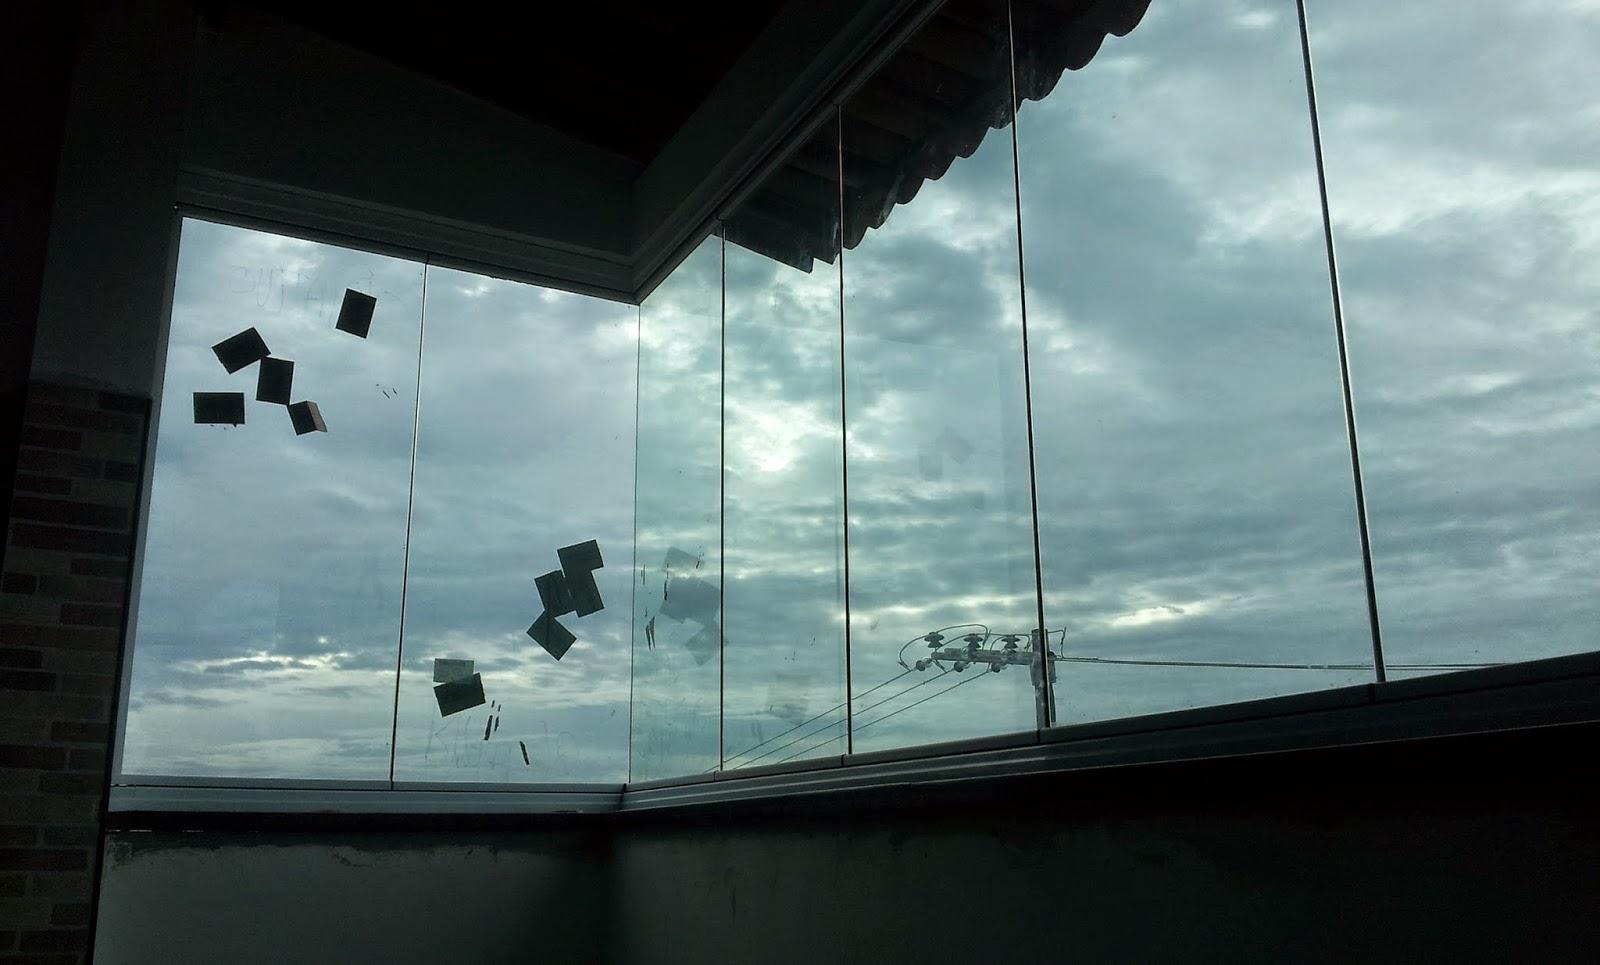 #4F7C76 Criativo Vidraçaria: Cortina de vidro em Fortaleza 92 Janelas De Vidro Em Fortaleza Ce